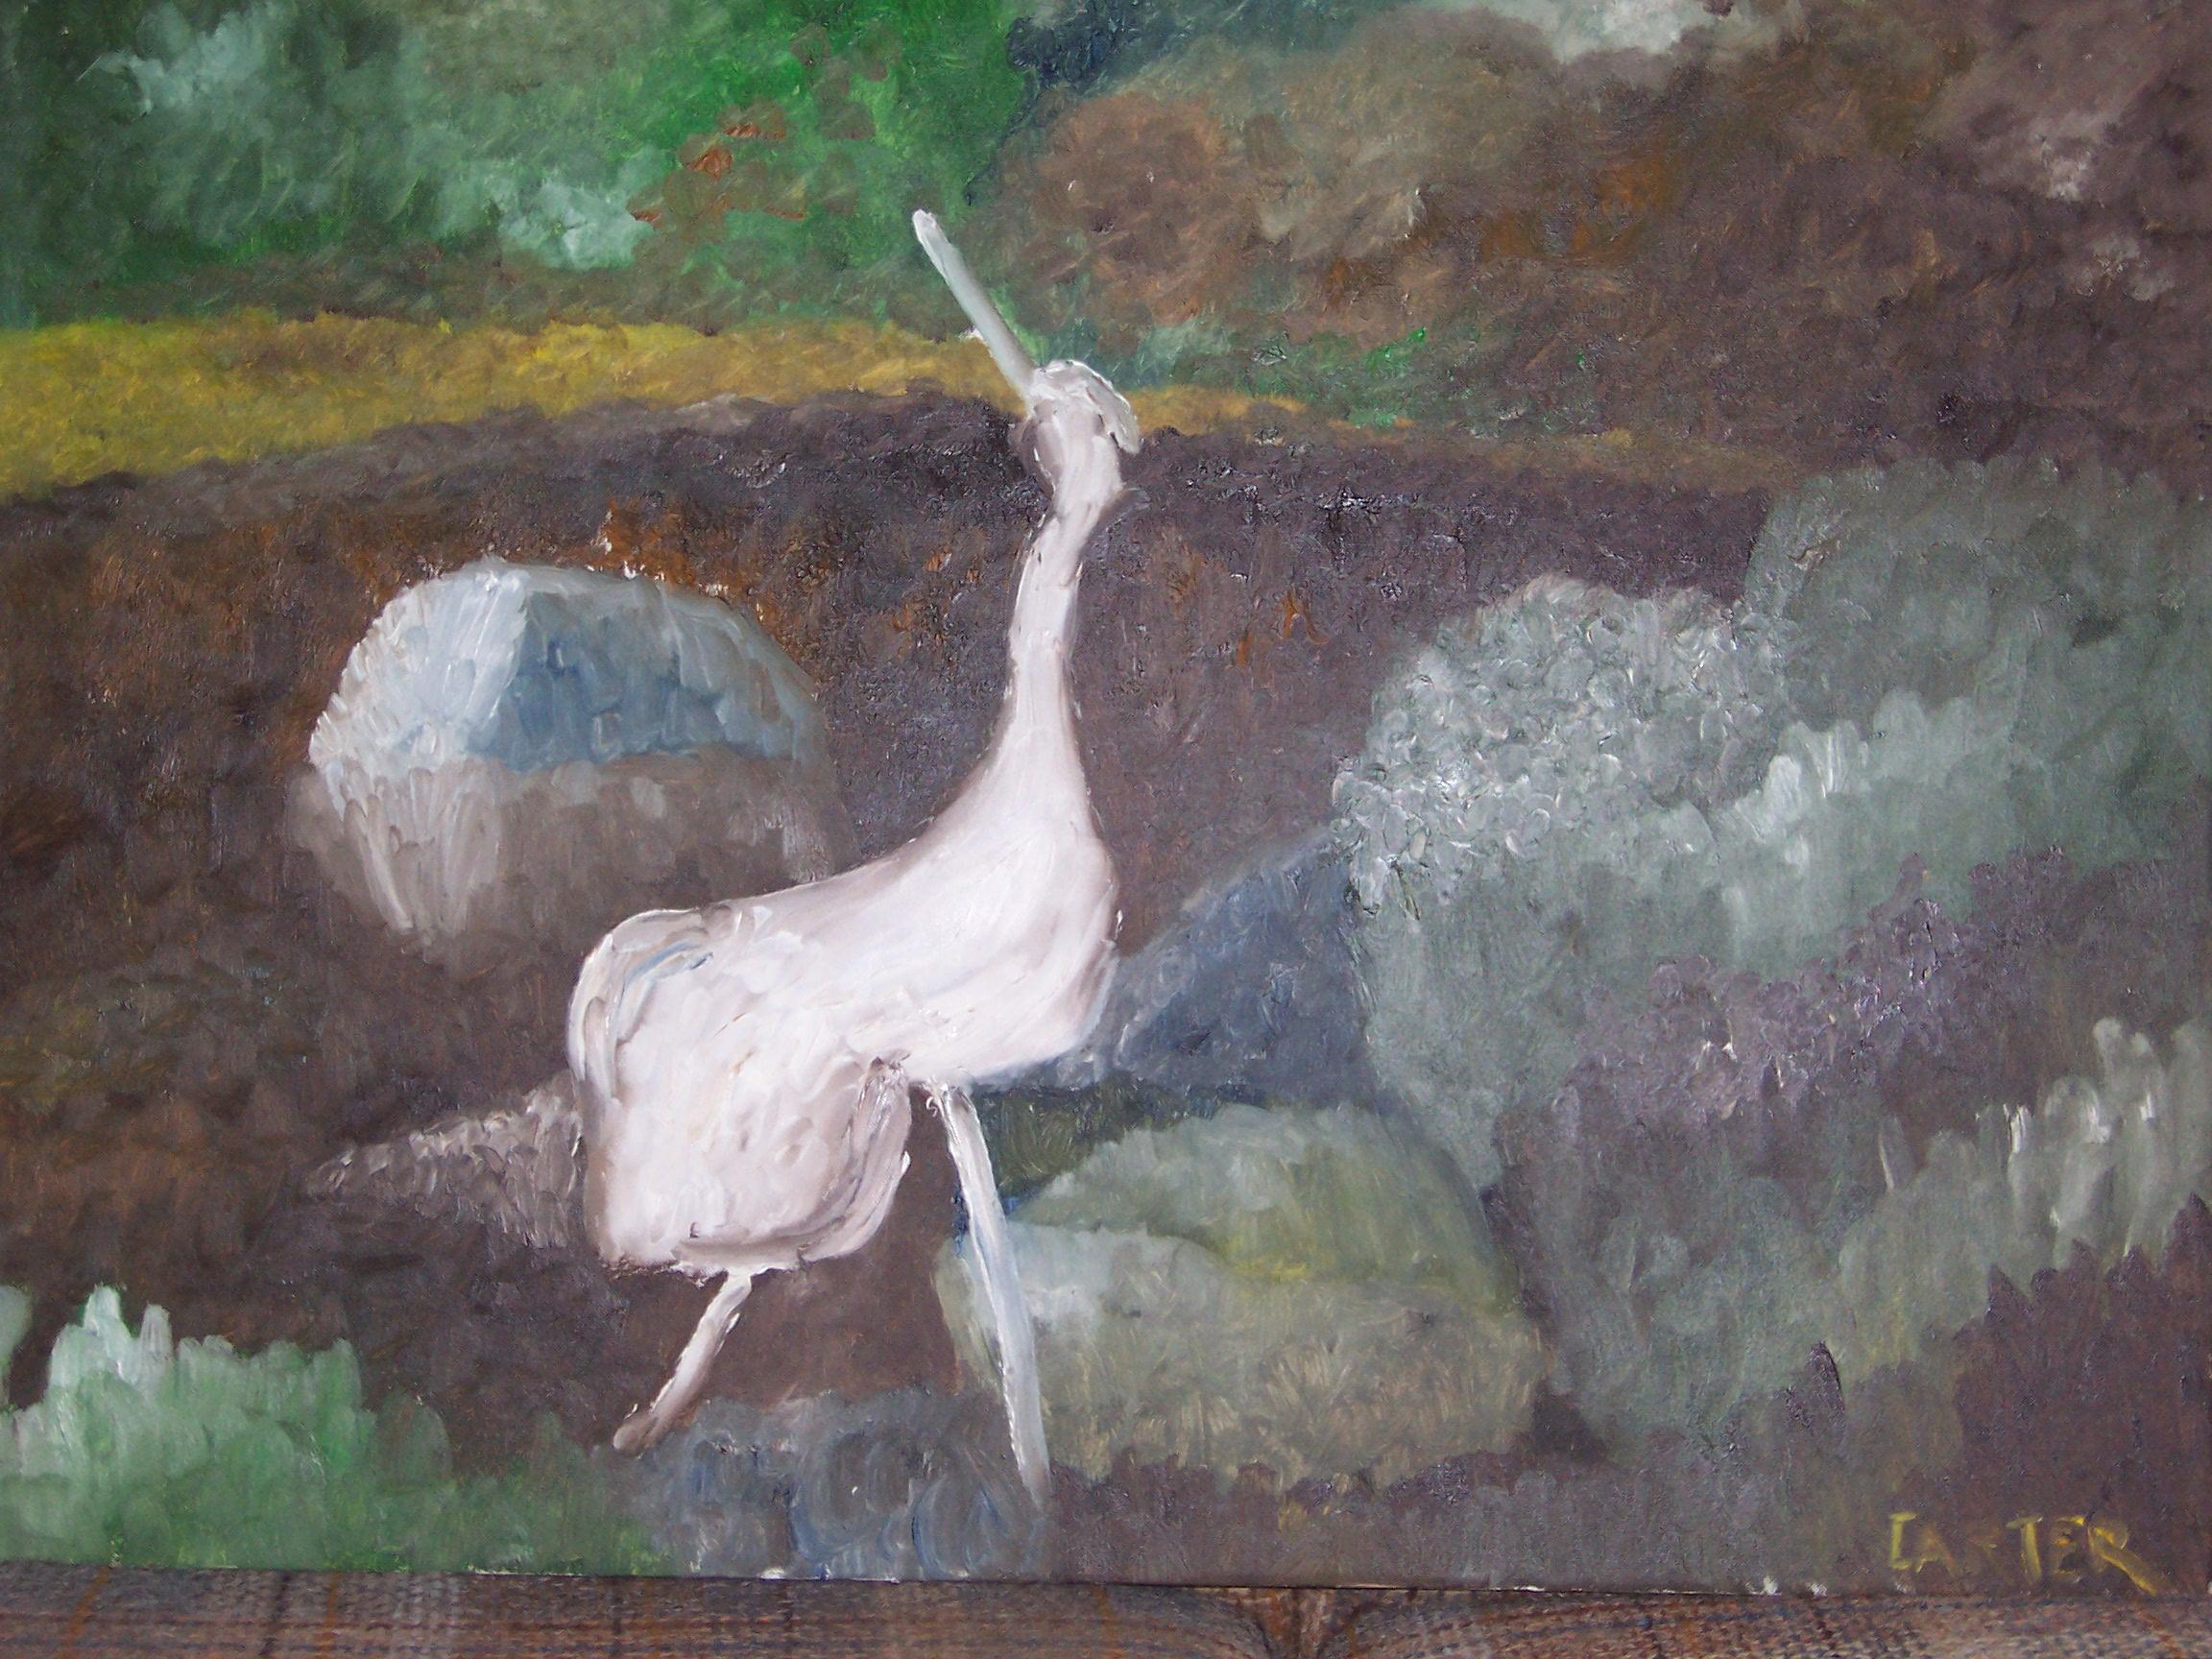 Japanese Garden Crane, 24x30, $300